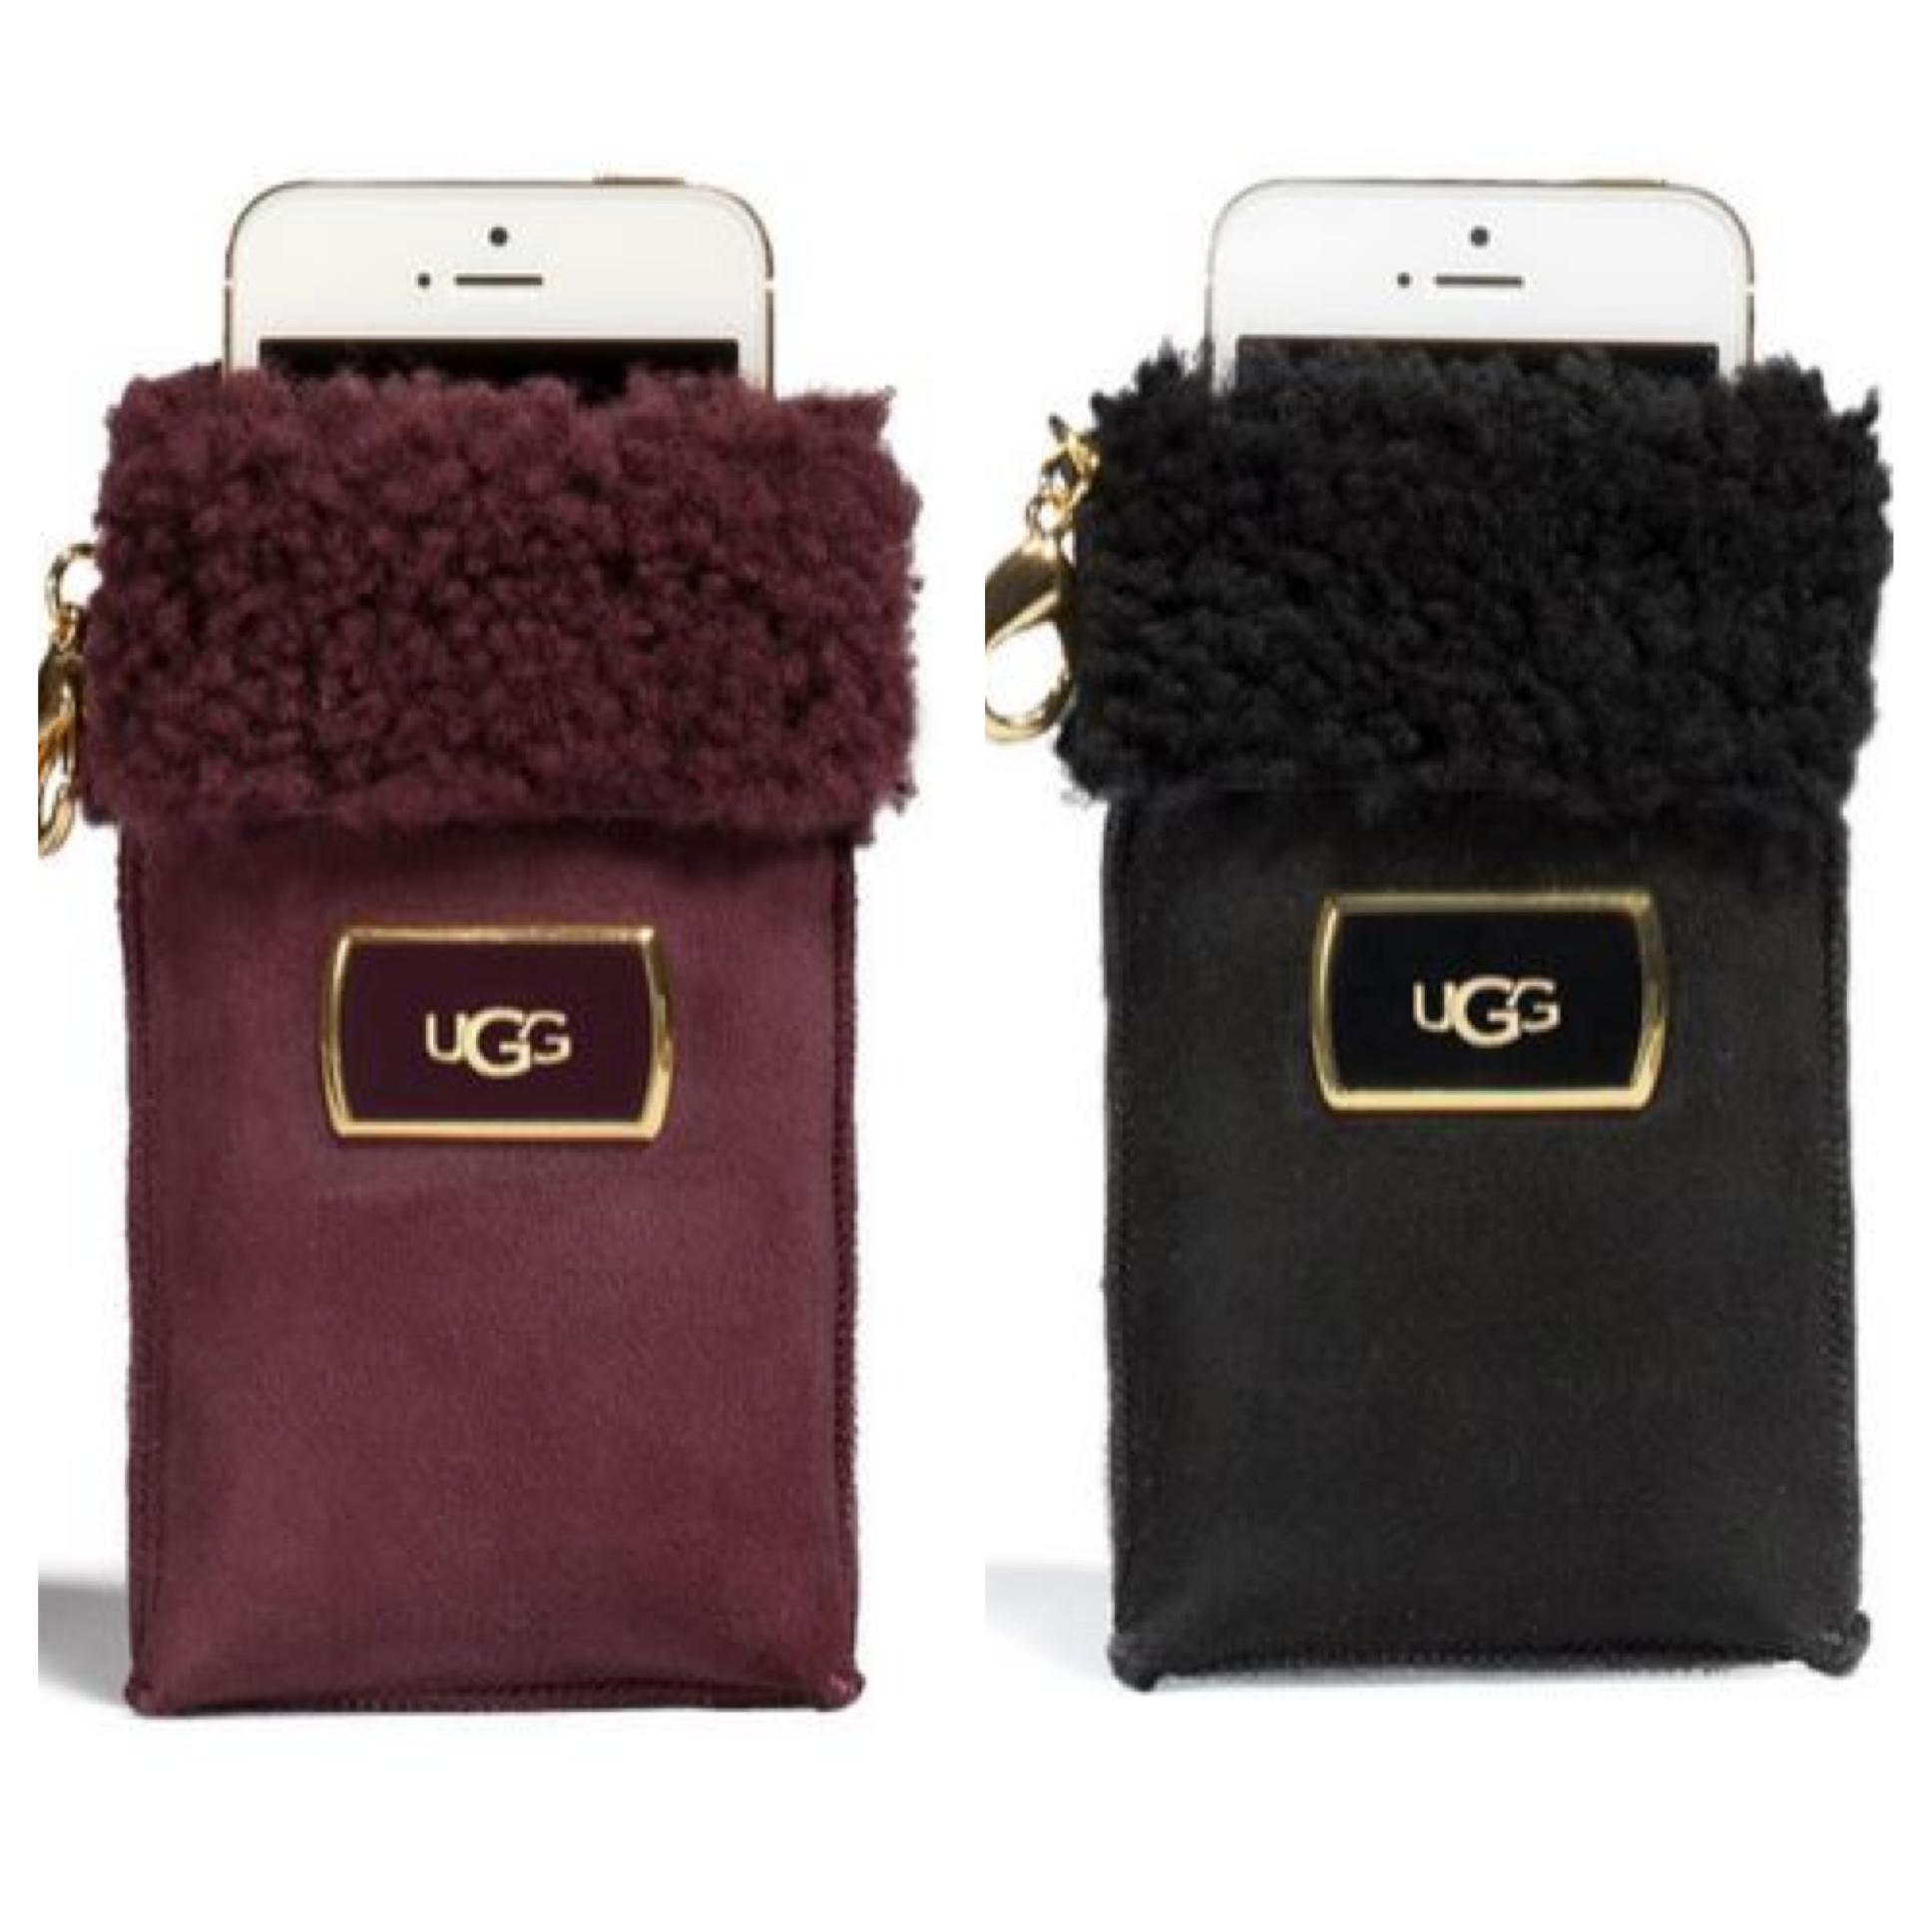 UGG Australia's Jane shearling phone sleeves